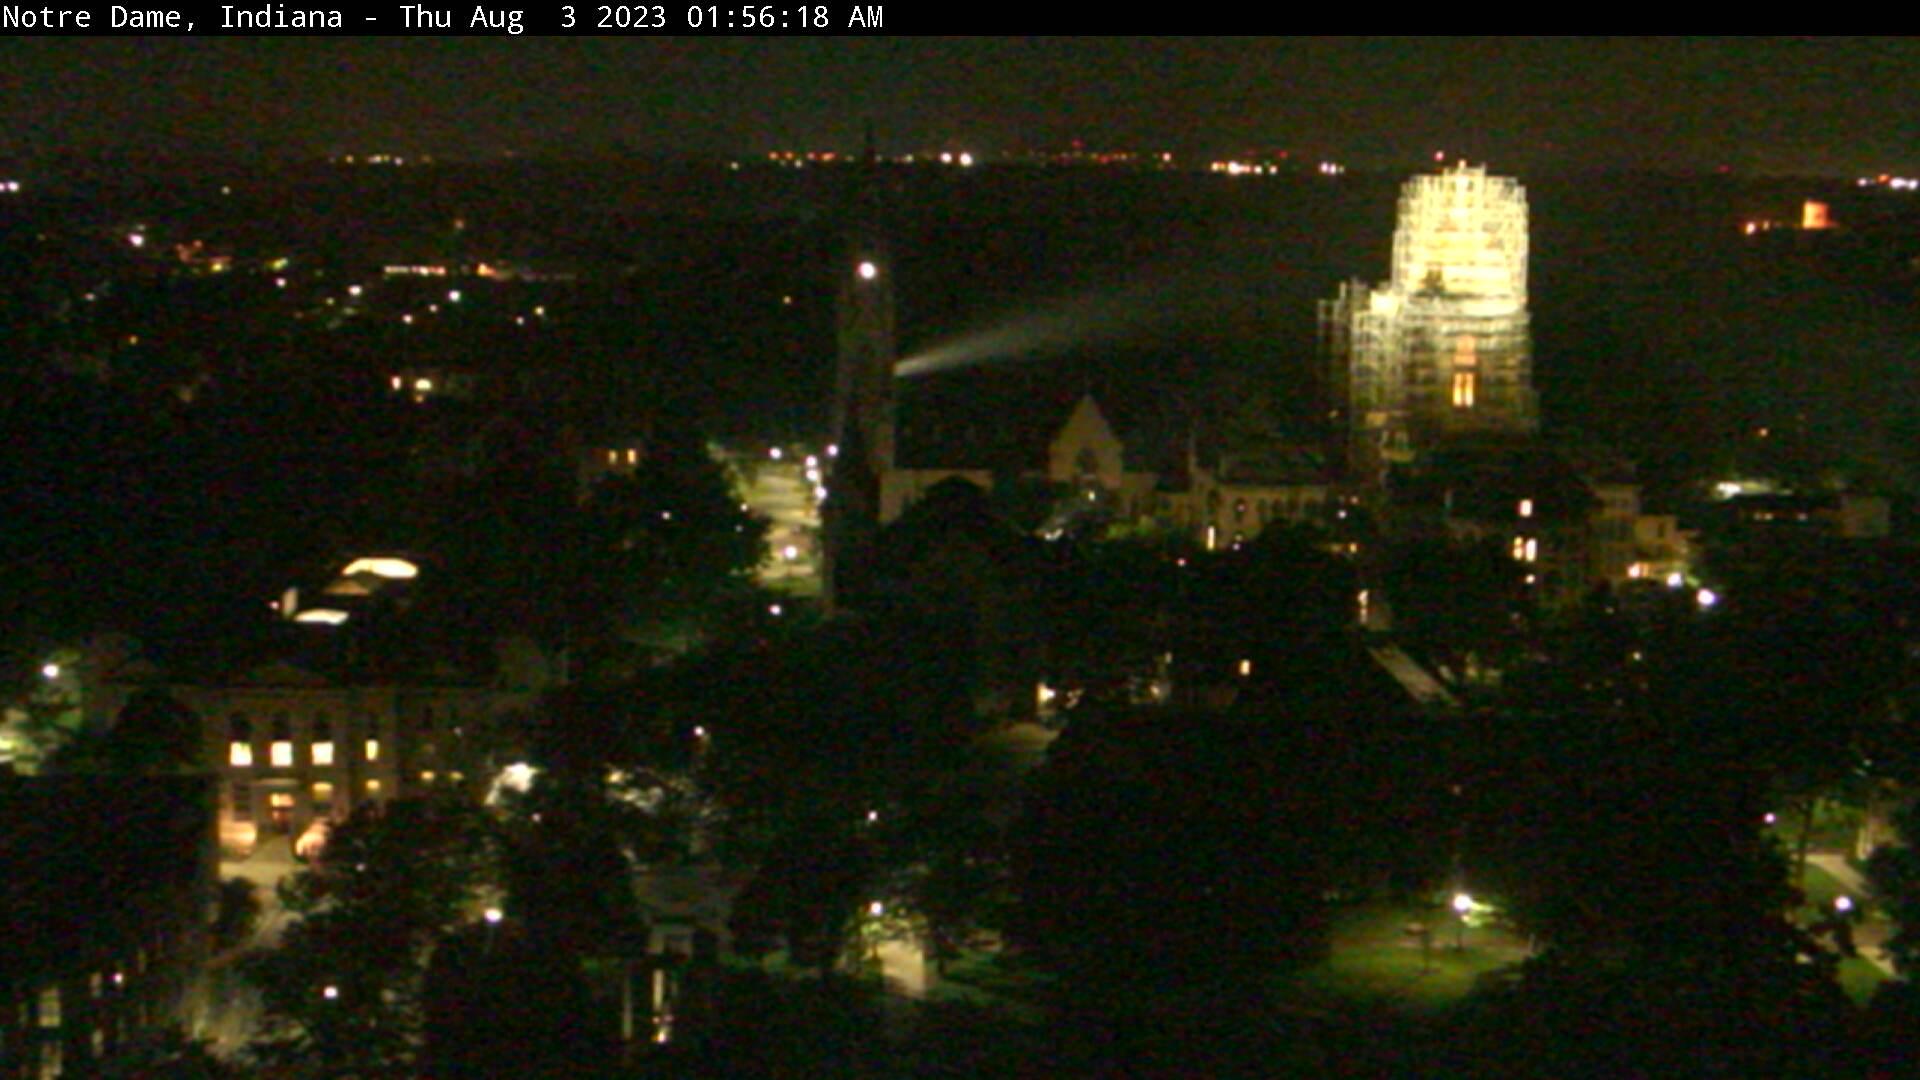 Notre Dame, Indiana Sat. 01:56